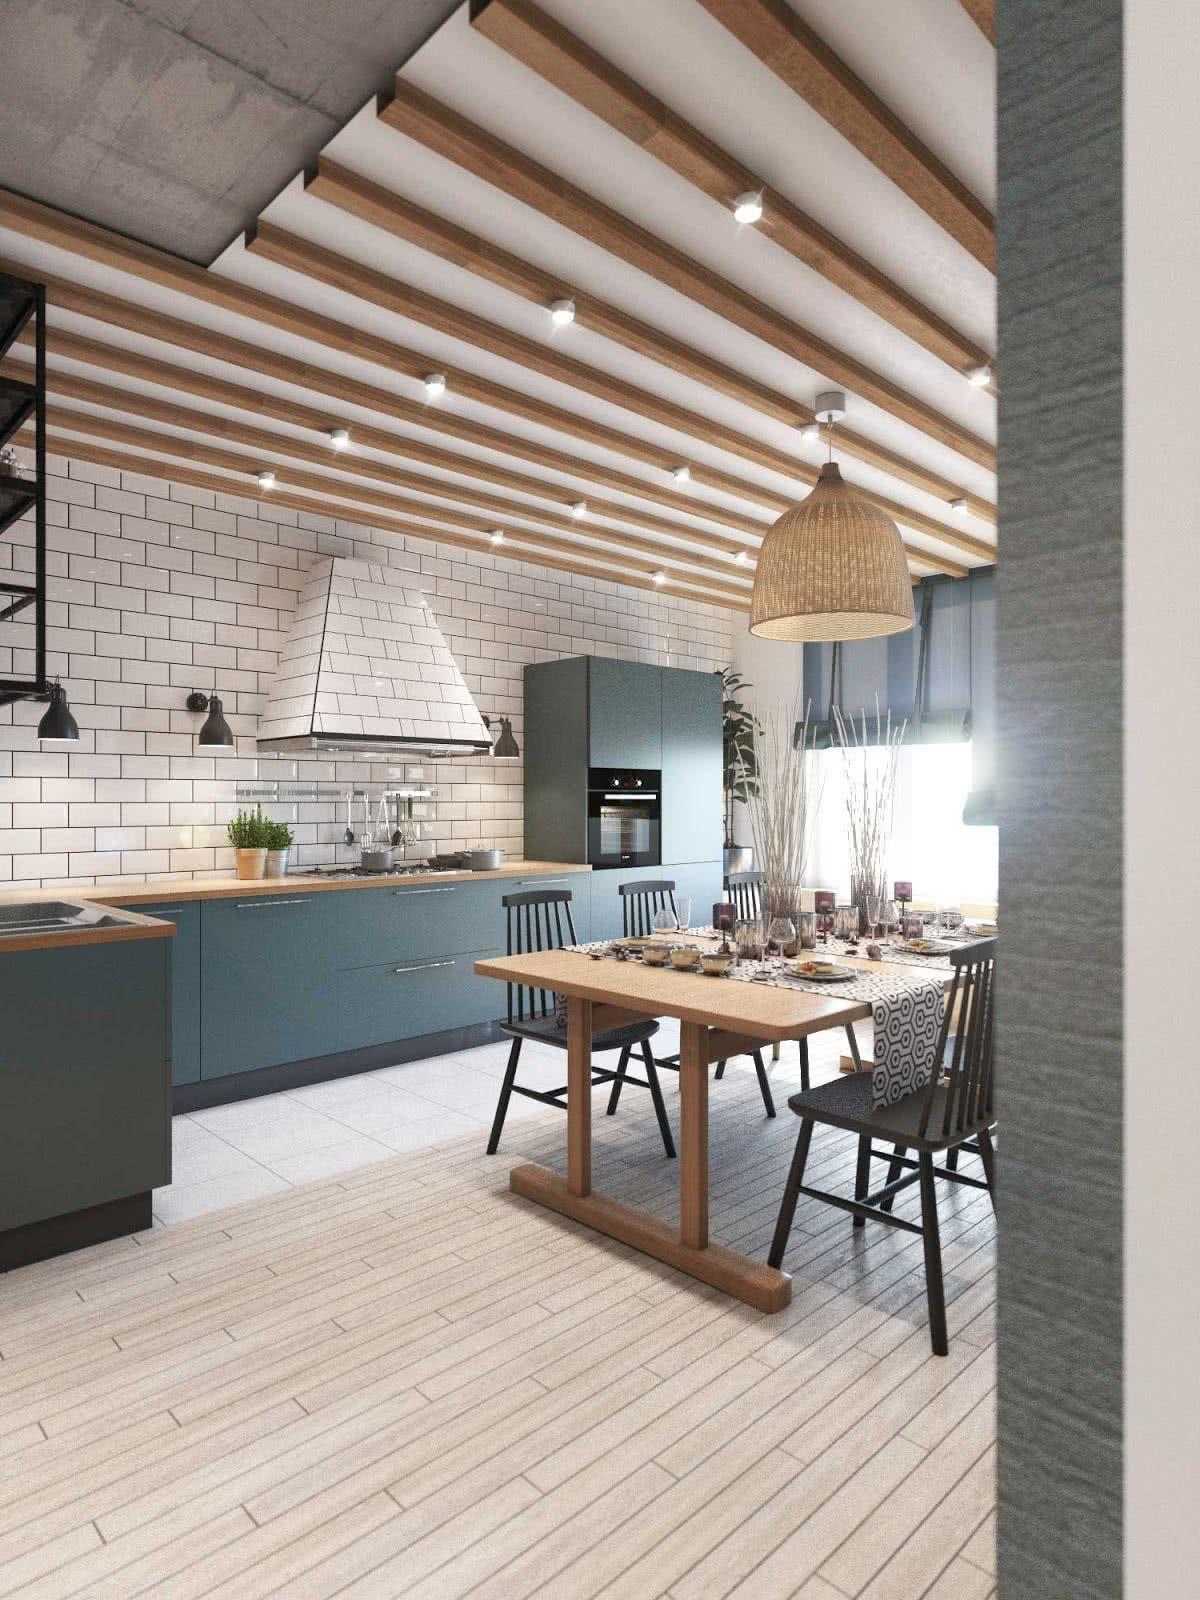 Styles in Latest Kitchen Design Trends 2021 0